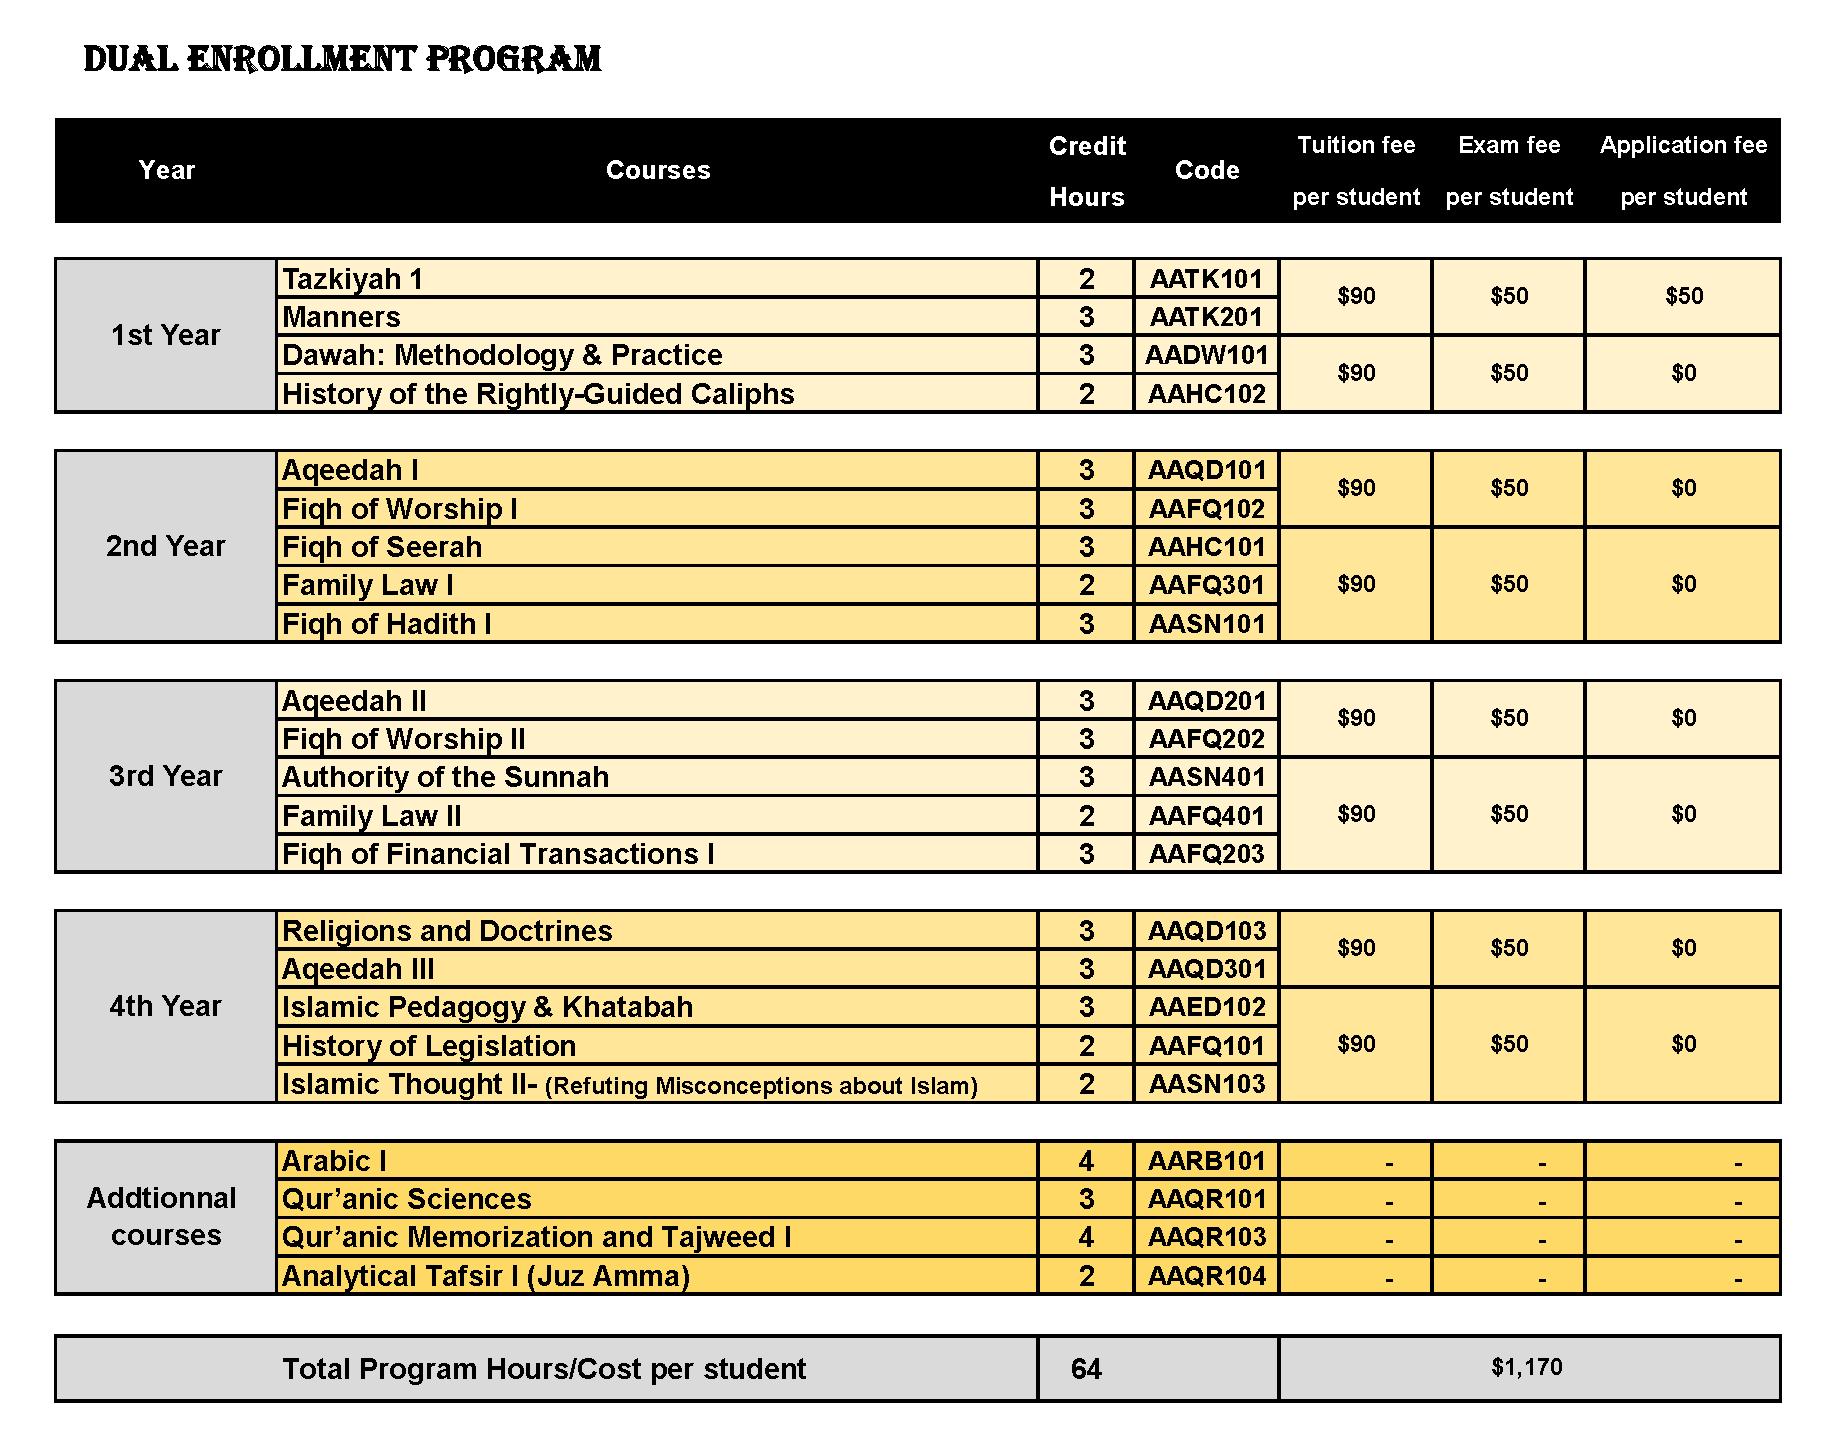 Dual Enrollment Program and Fees